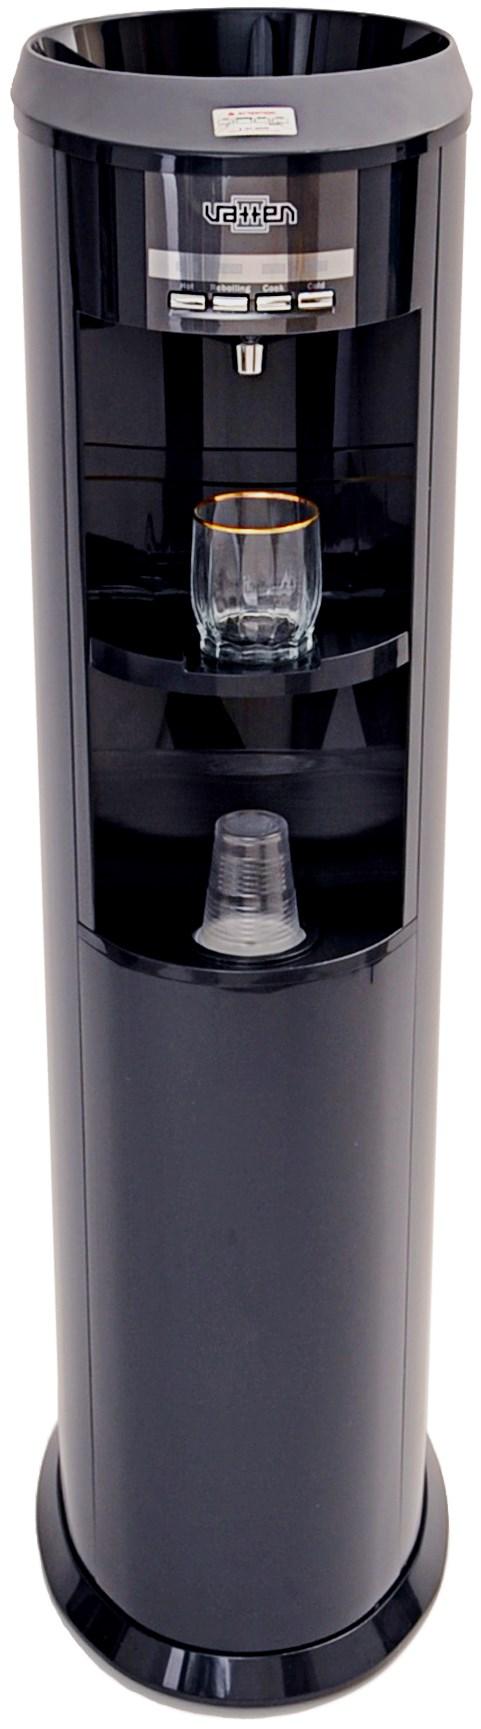 Кулер для воды VATTEN V803NKDG